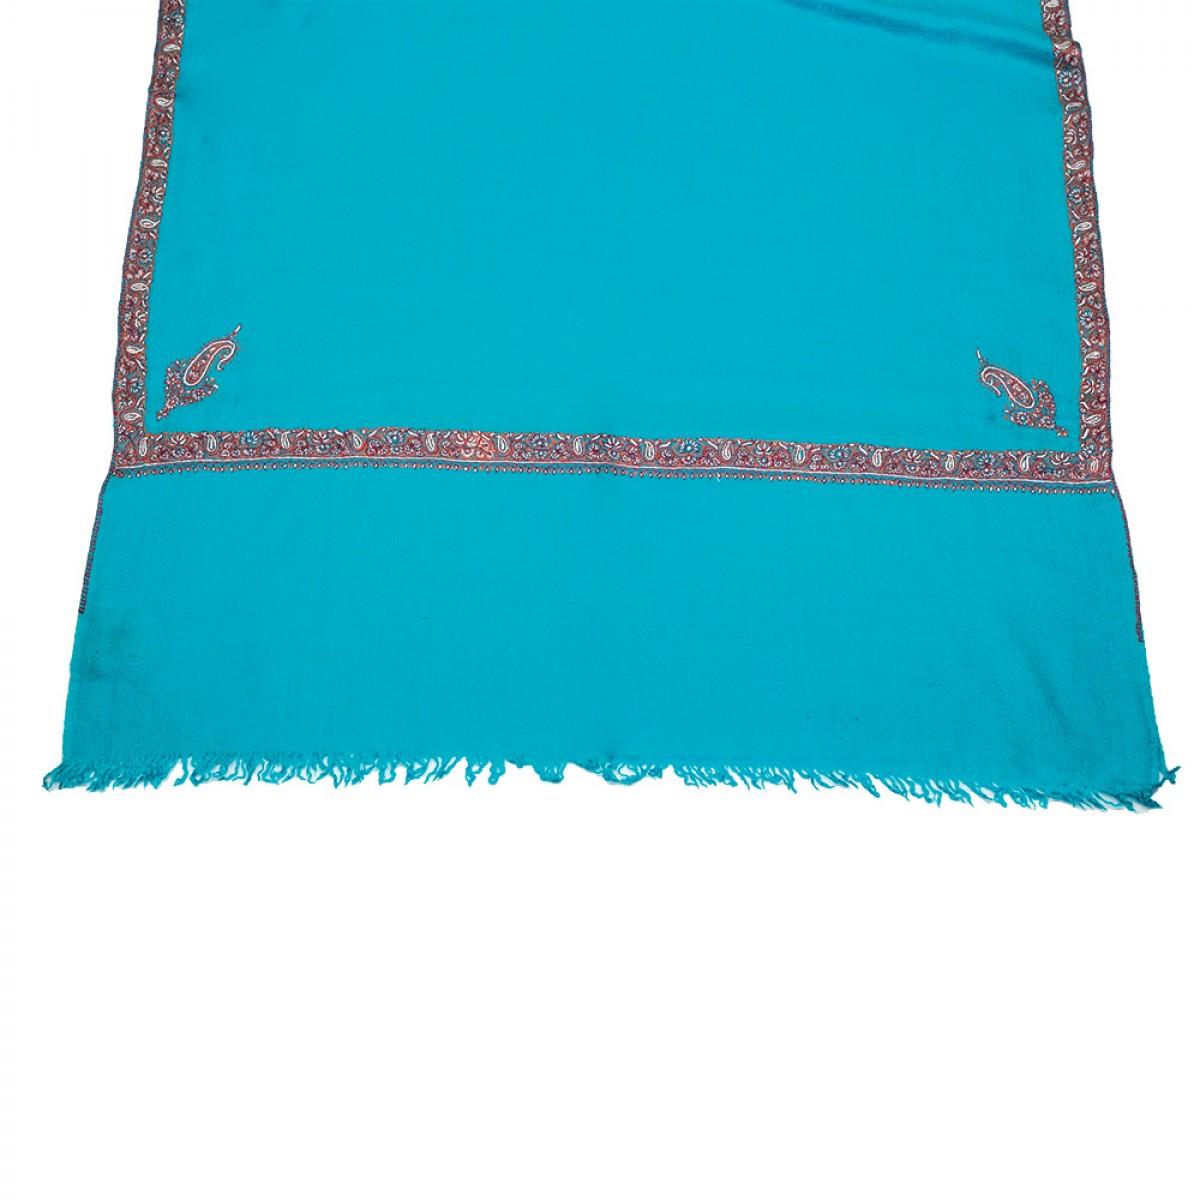 Embroidered Pashmina Stole - Blue & White